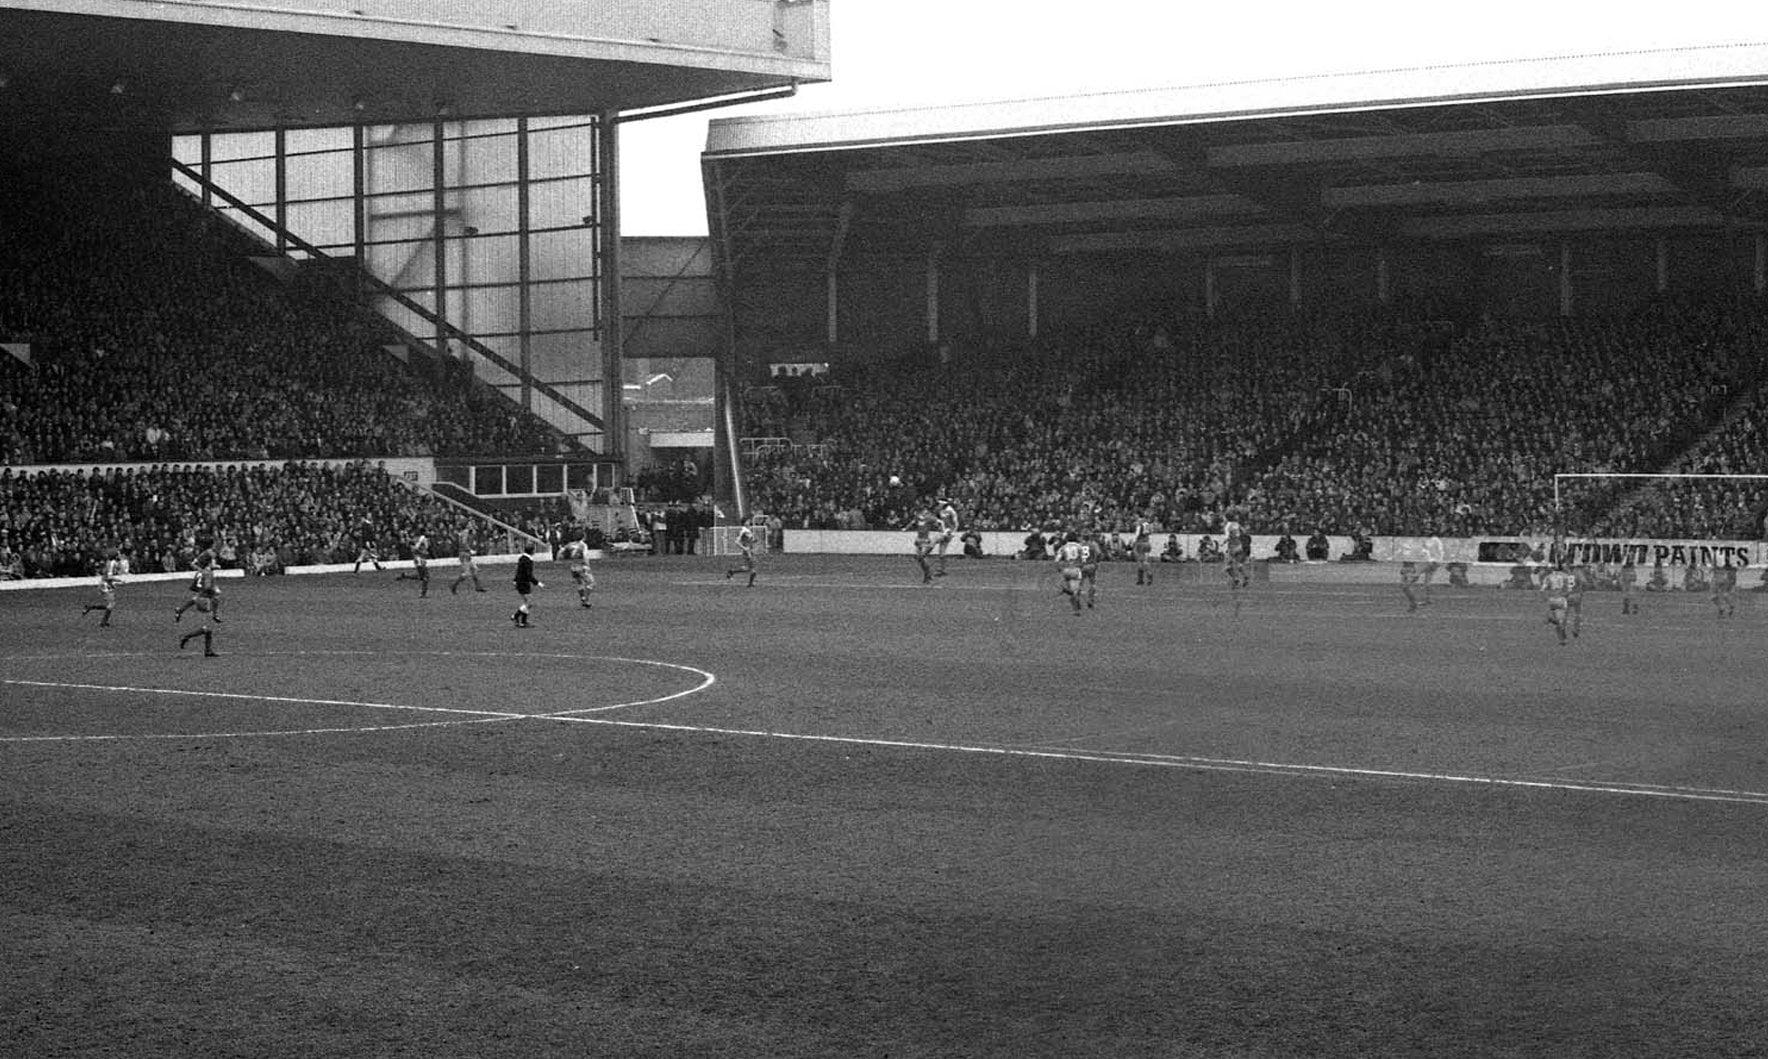 The History of Liverpool FC - Anfield oStadium